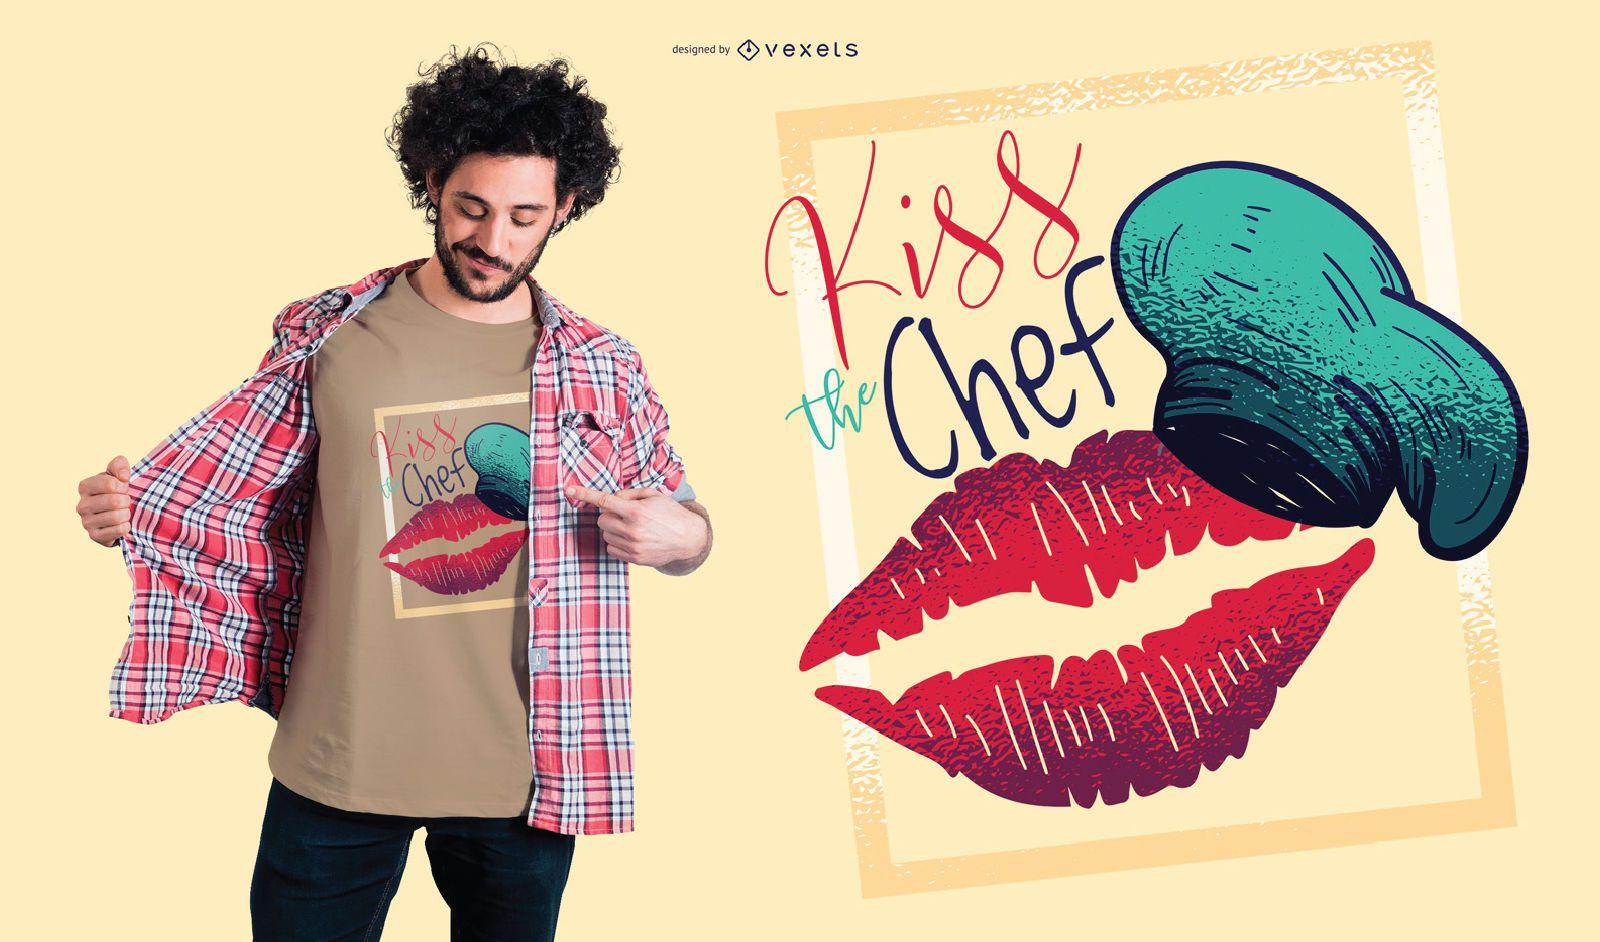 Kiss the chef t-shirt design